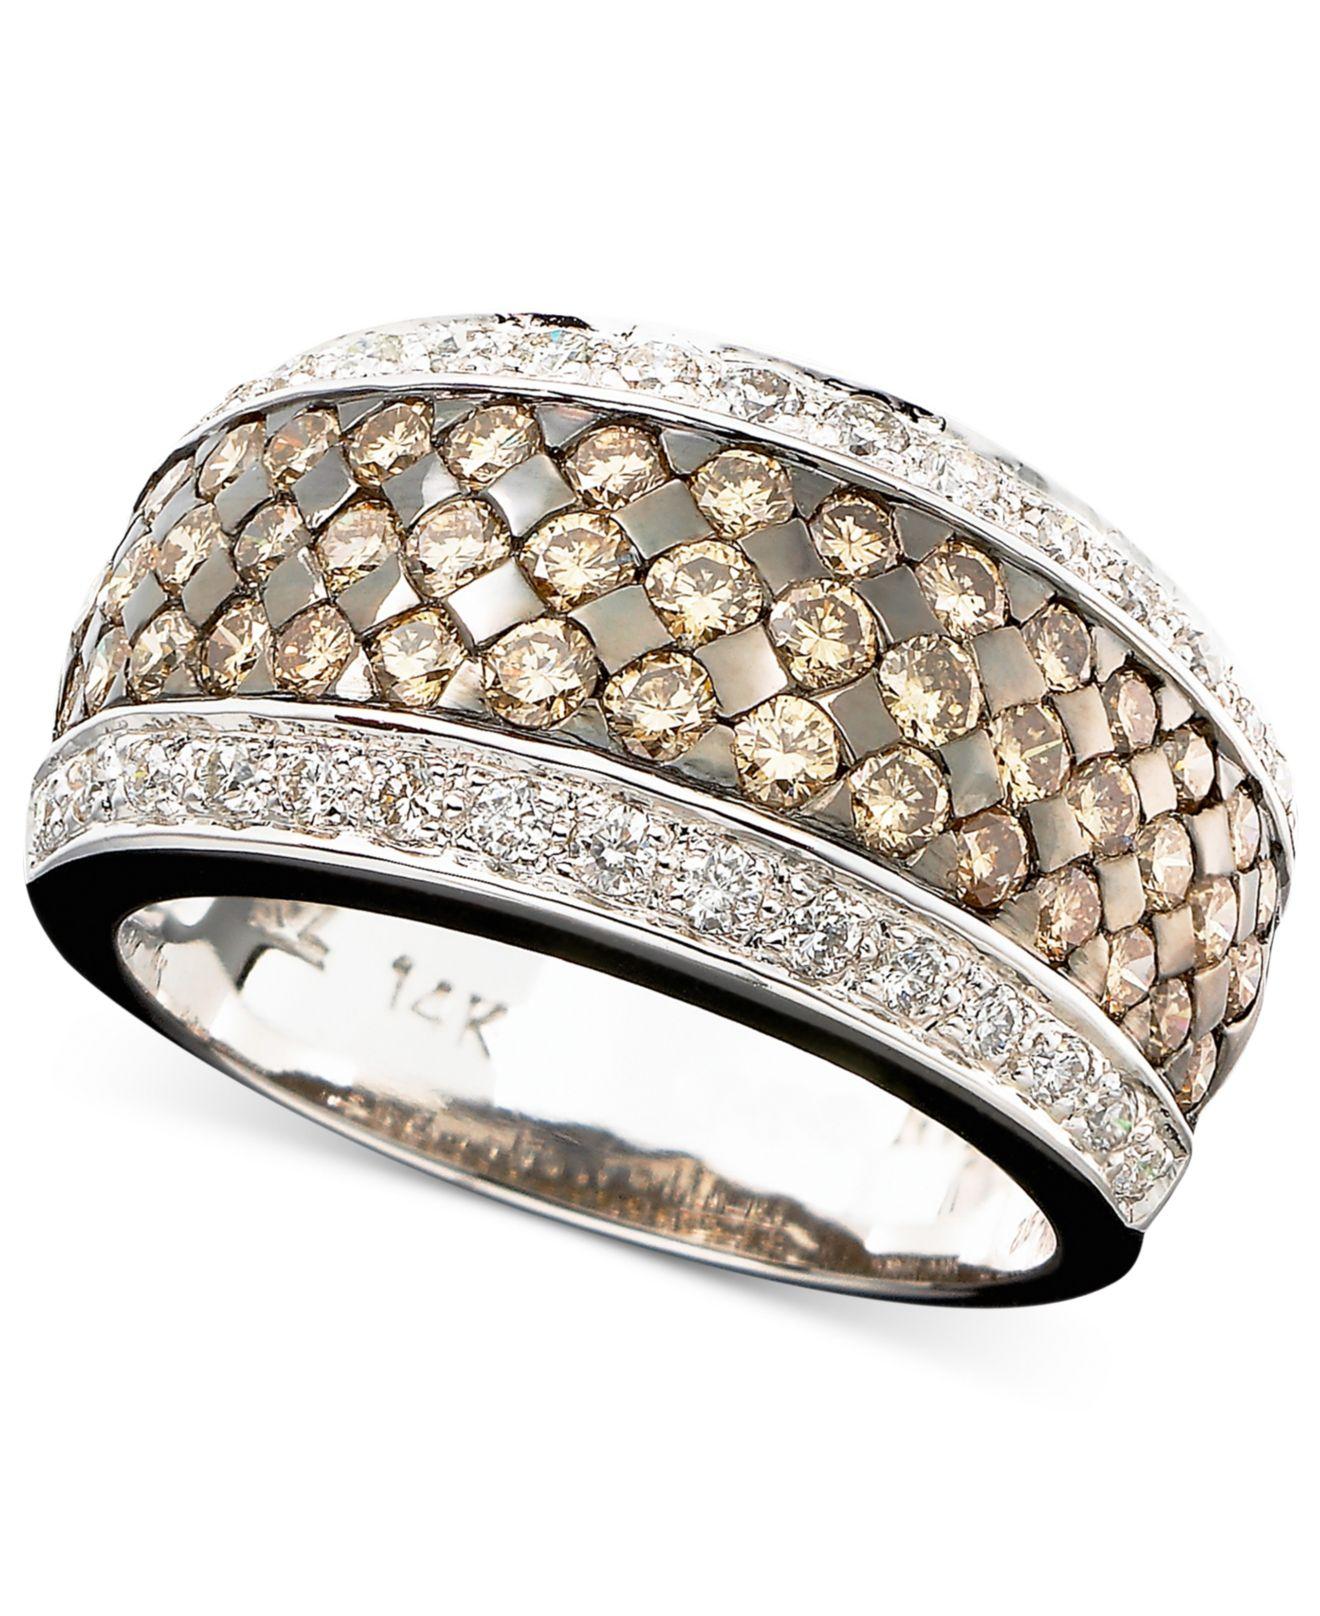 Le Vian Diamond Rings For Sale